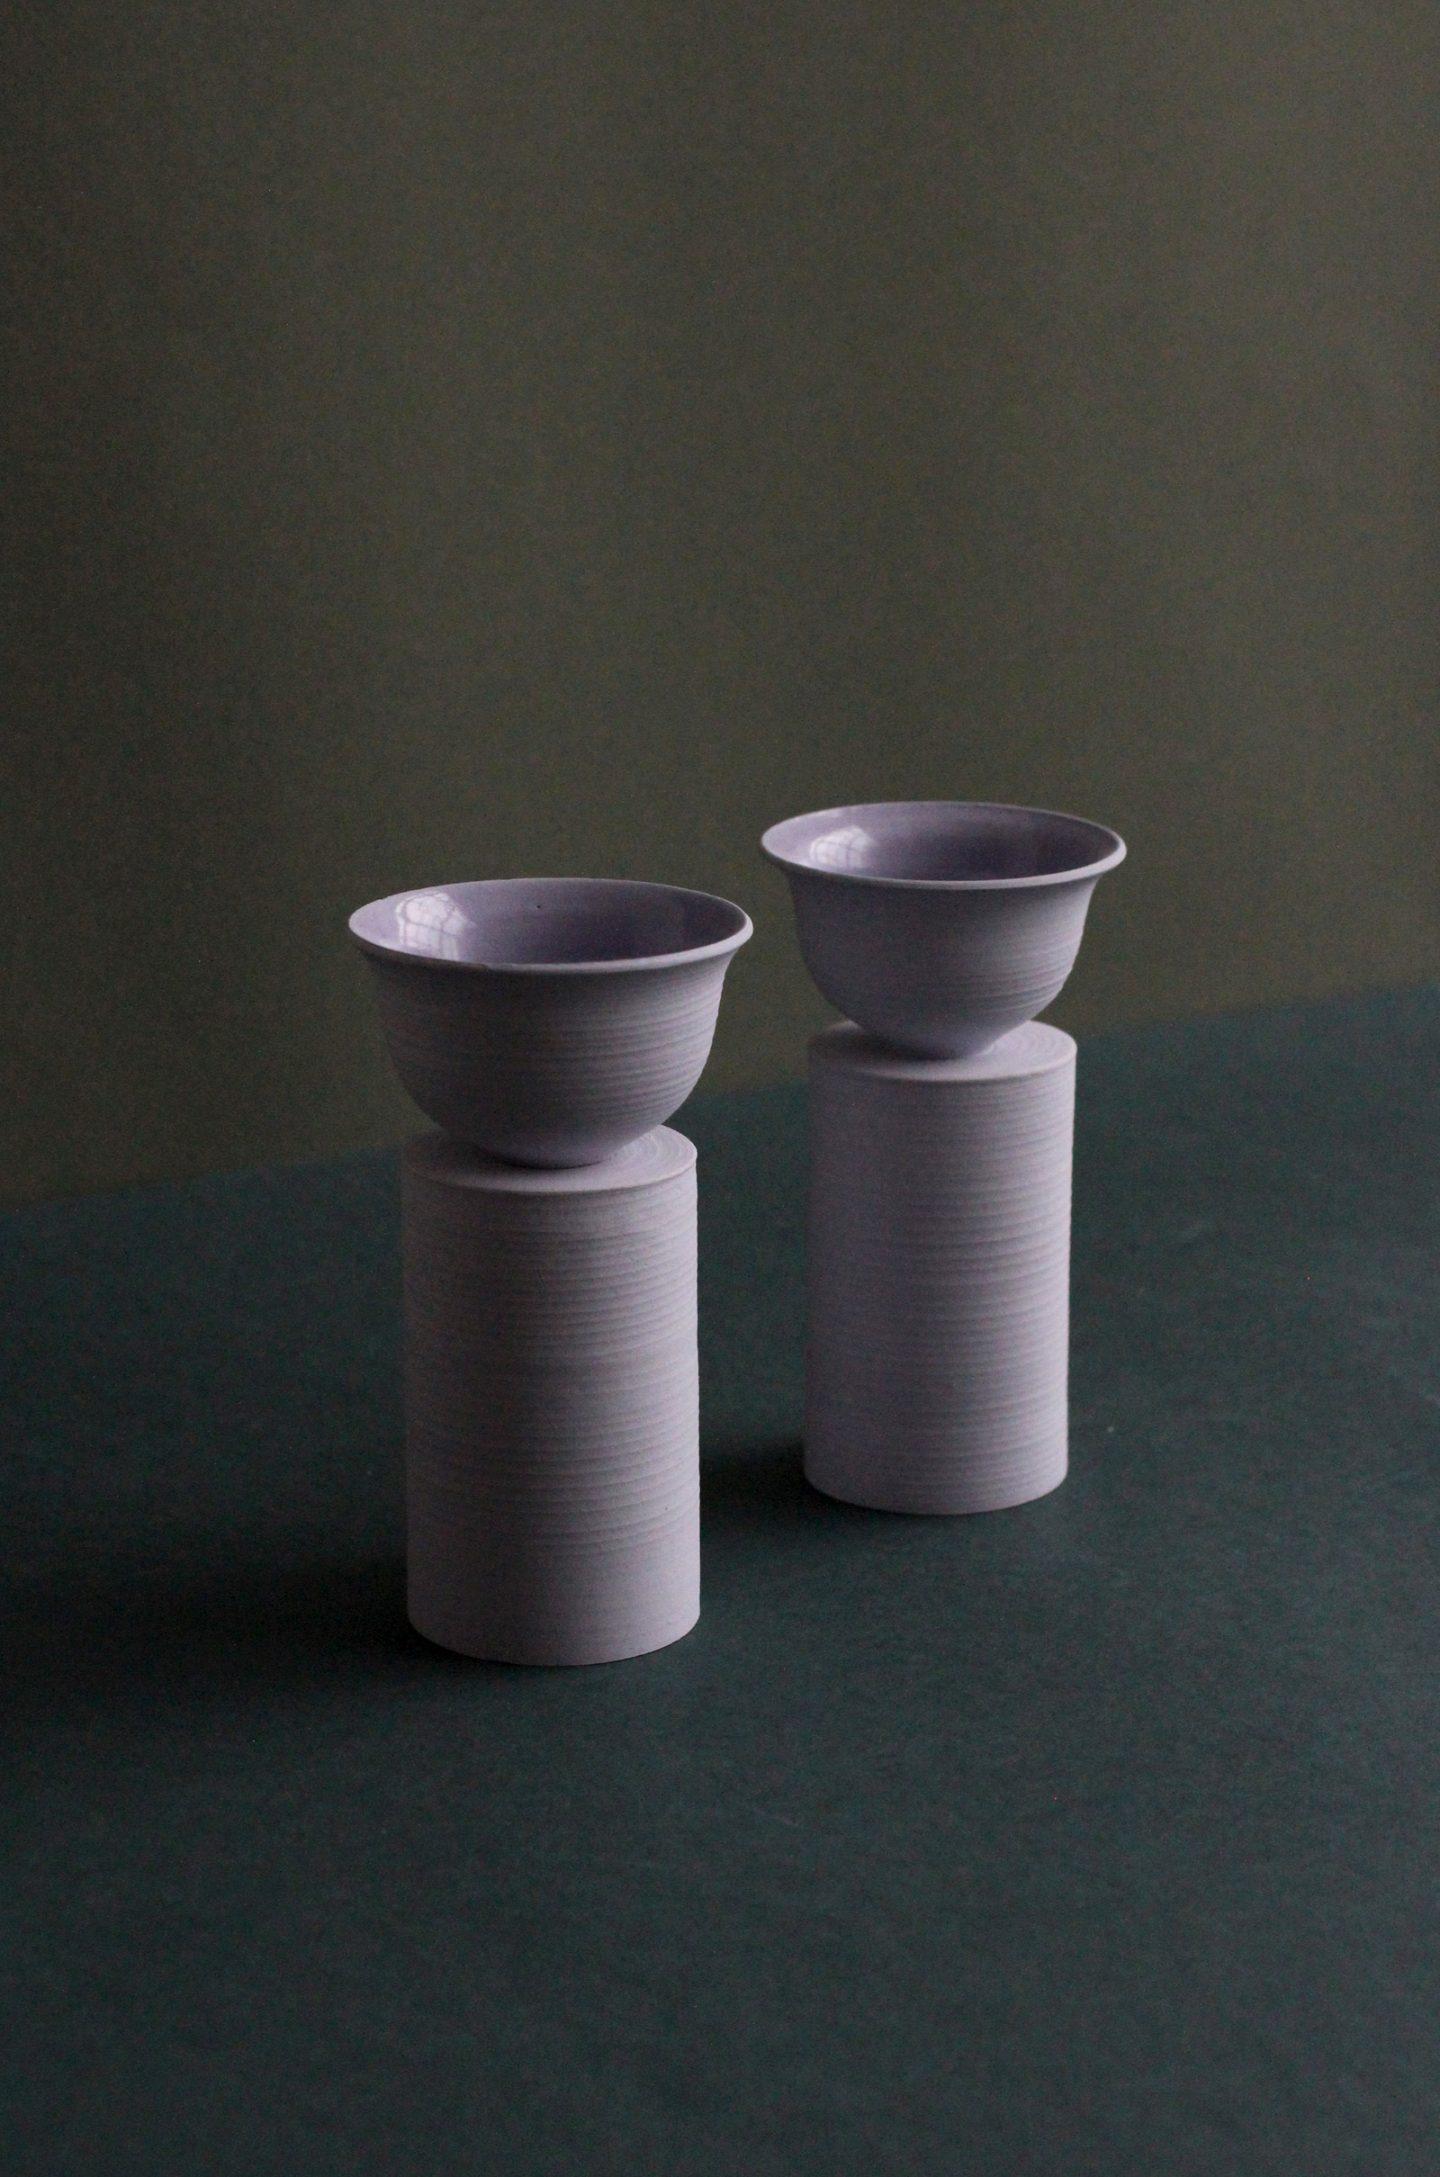 Design-Natalie-Weinberger-Ceramics-14